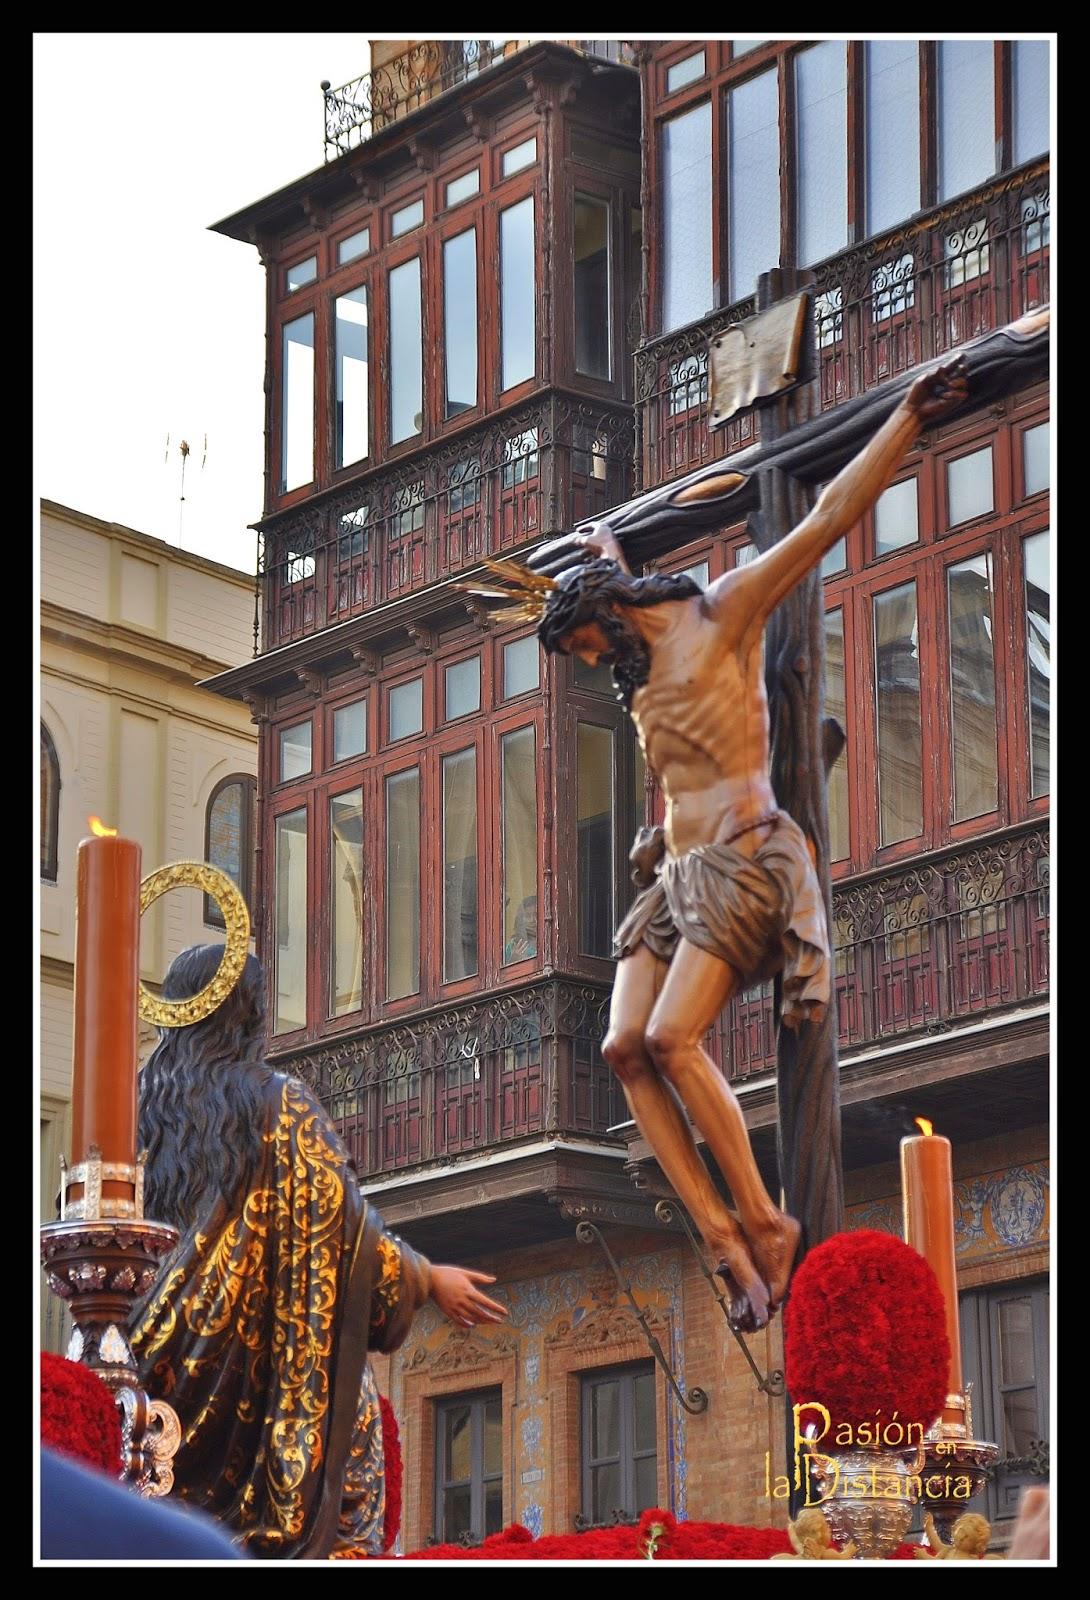 Cristo-Buena-Muerte-La-Hiniesta-Sevilla-2015